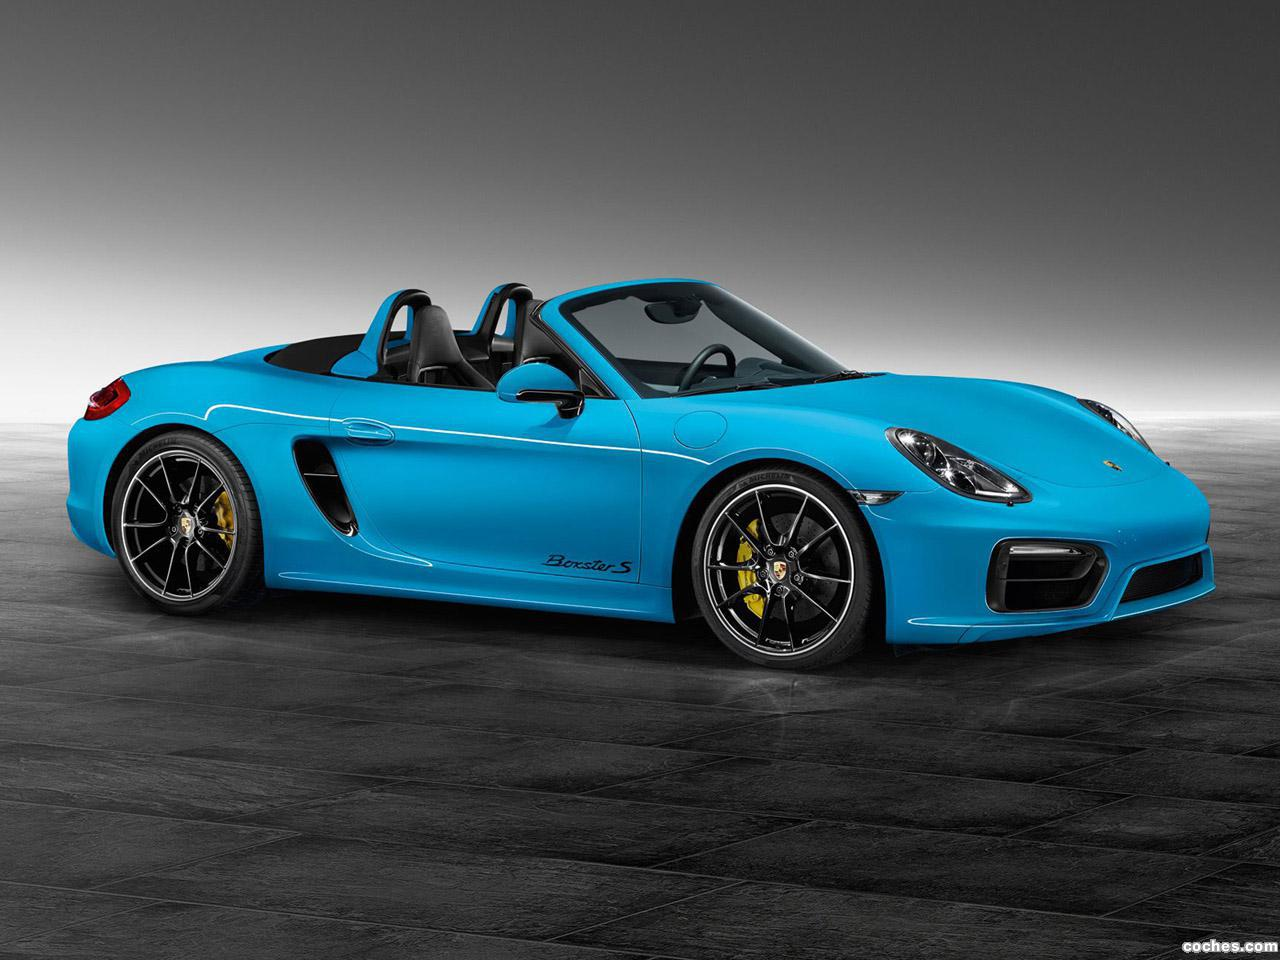 Foto 0 de Porsche Boxster S Exclusive Bespoke 2014